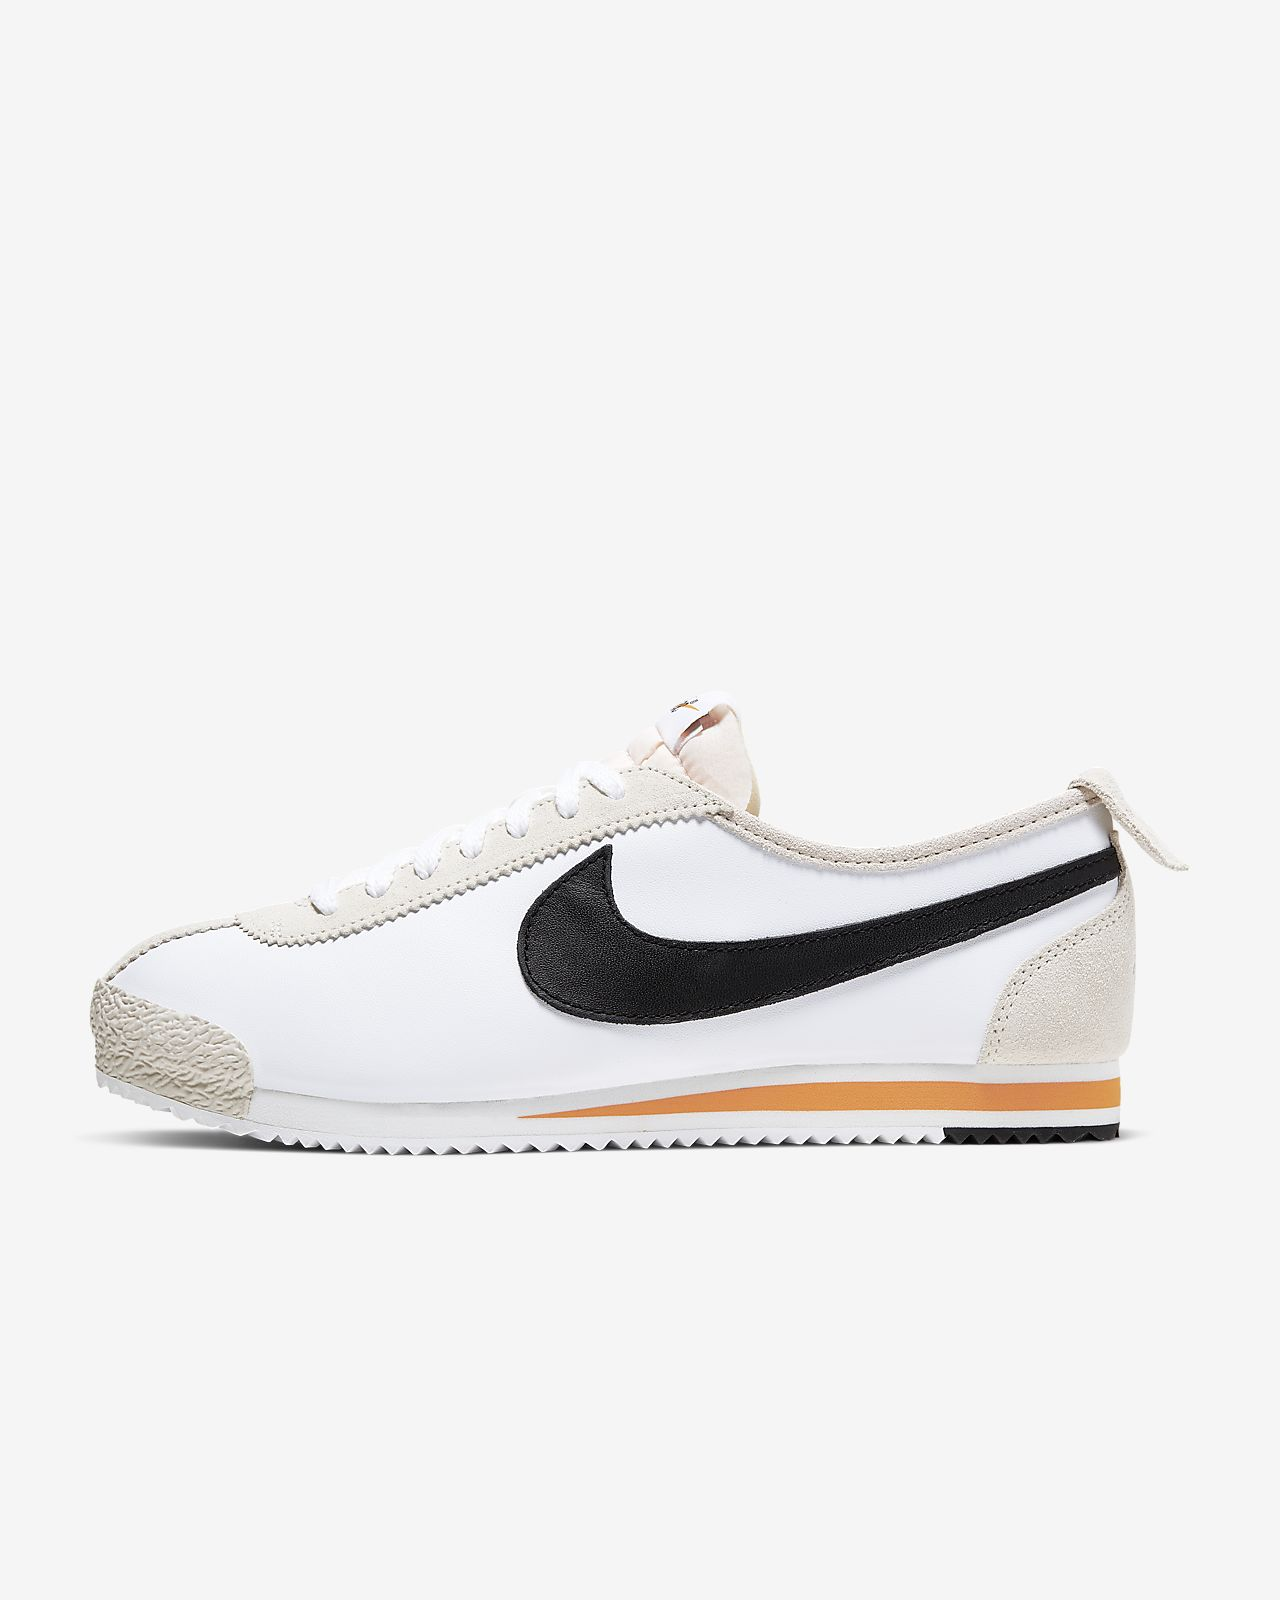 Nike Cortez '72 Men's Shoe